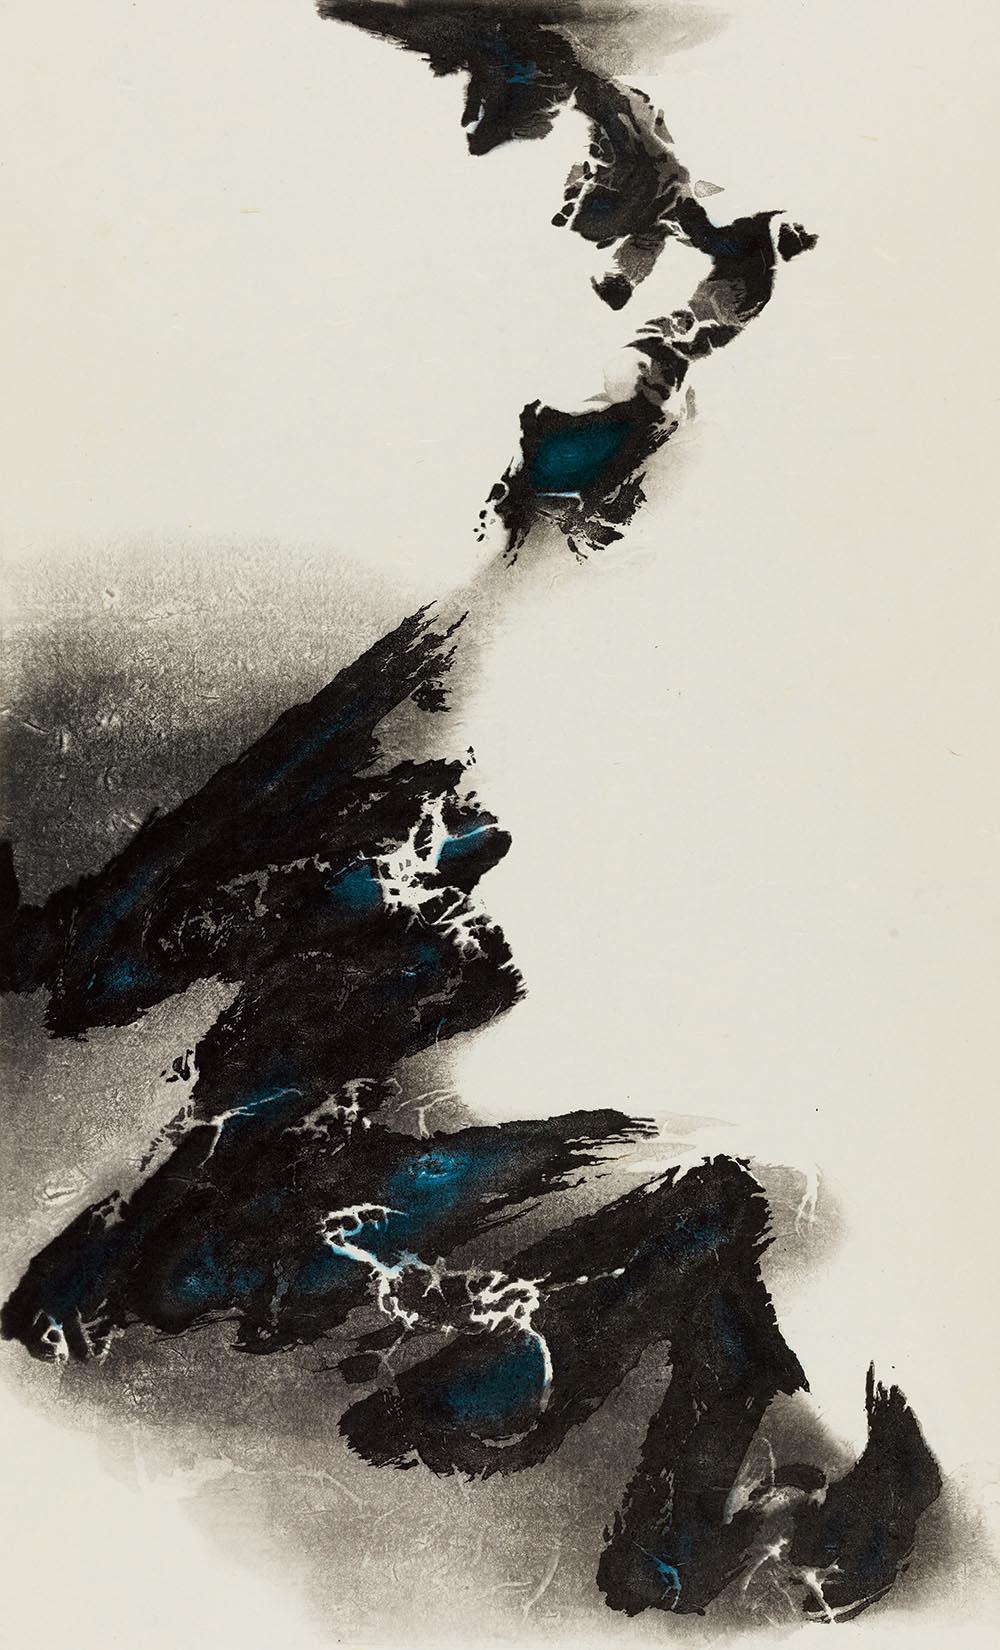 劉國松 LIU Kuo-Sung〈升向白茫茫的未知 Rising toward Mysterious Whiteness〉